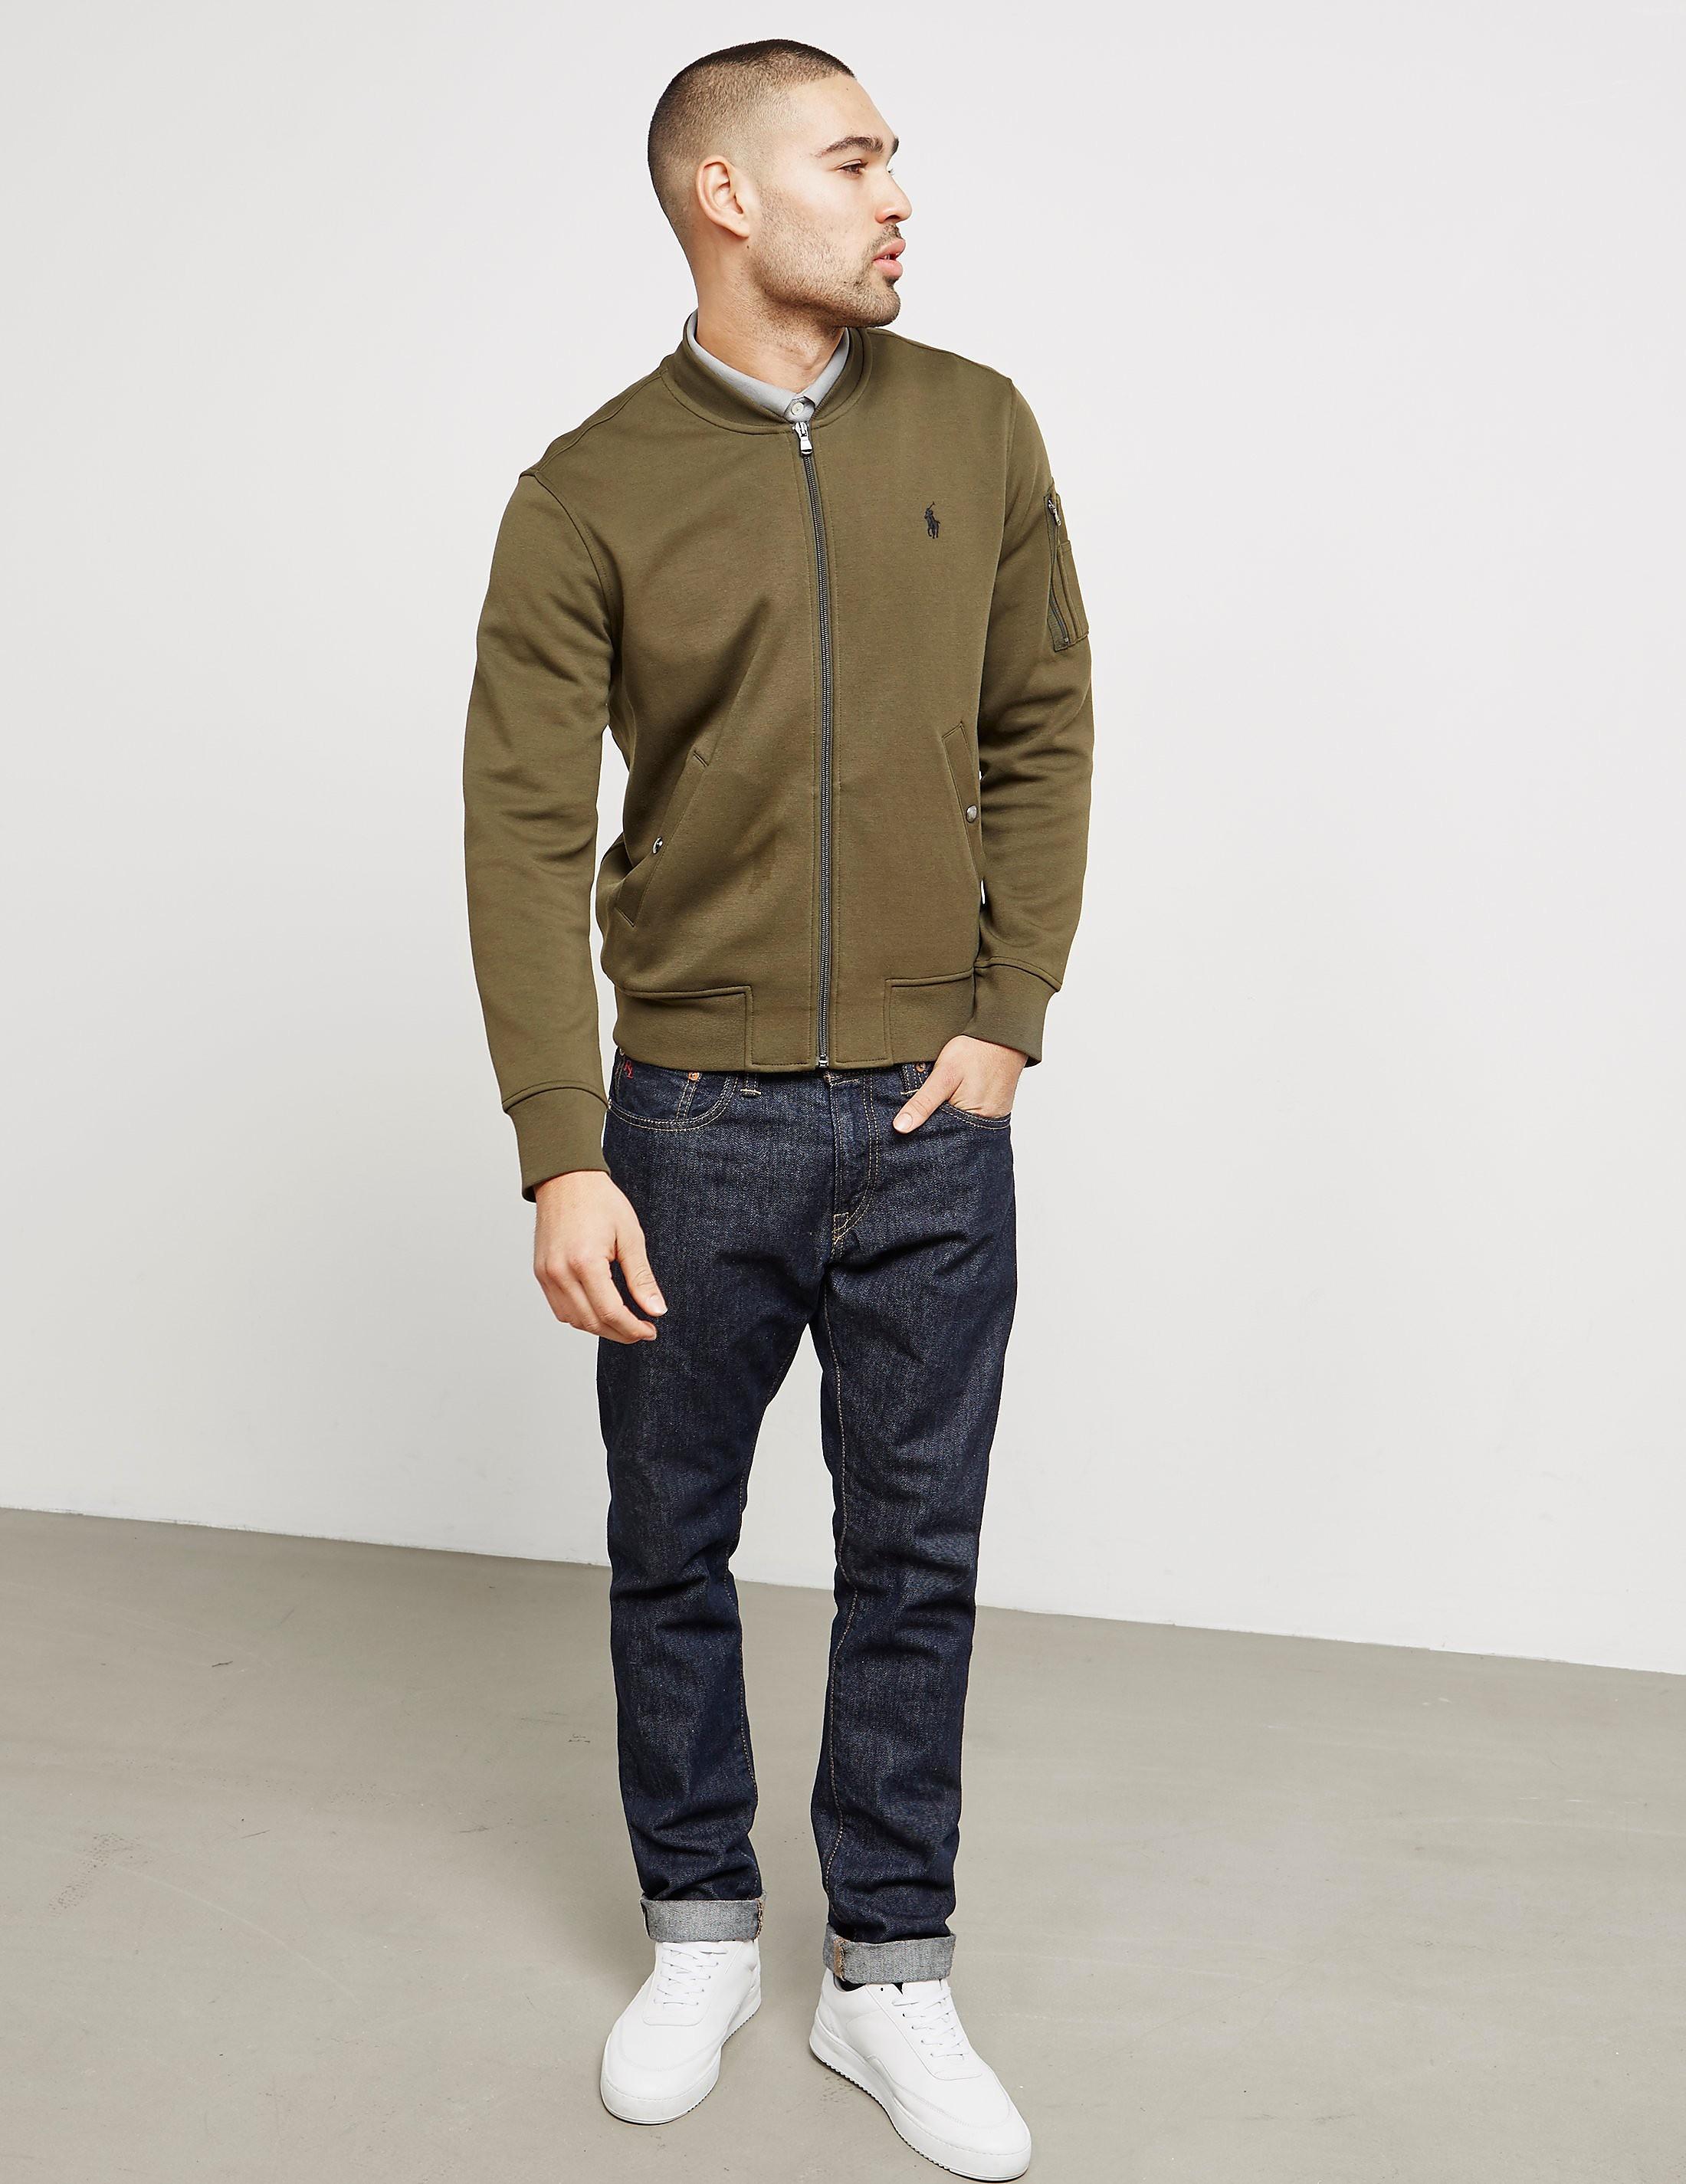 Polo Ralph Lauren Fleece Bomber Jacket